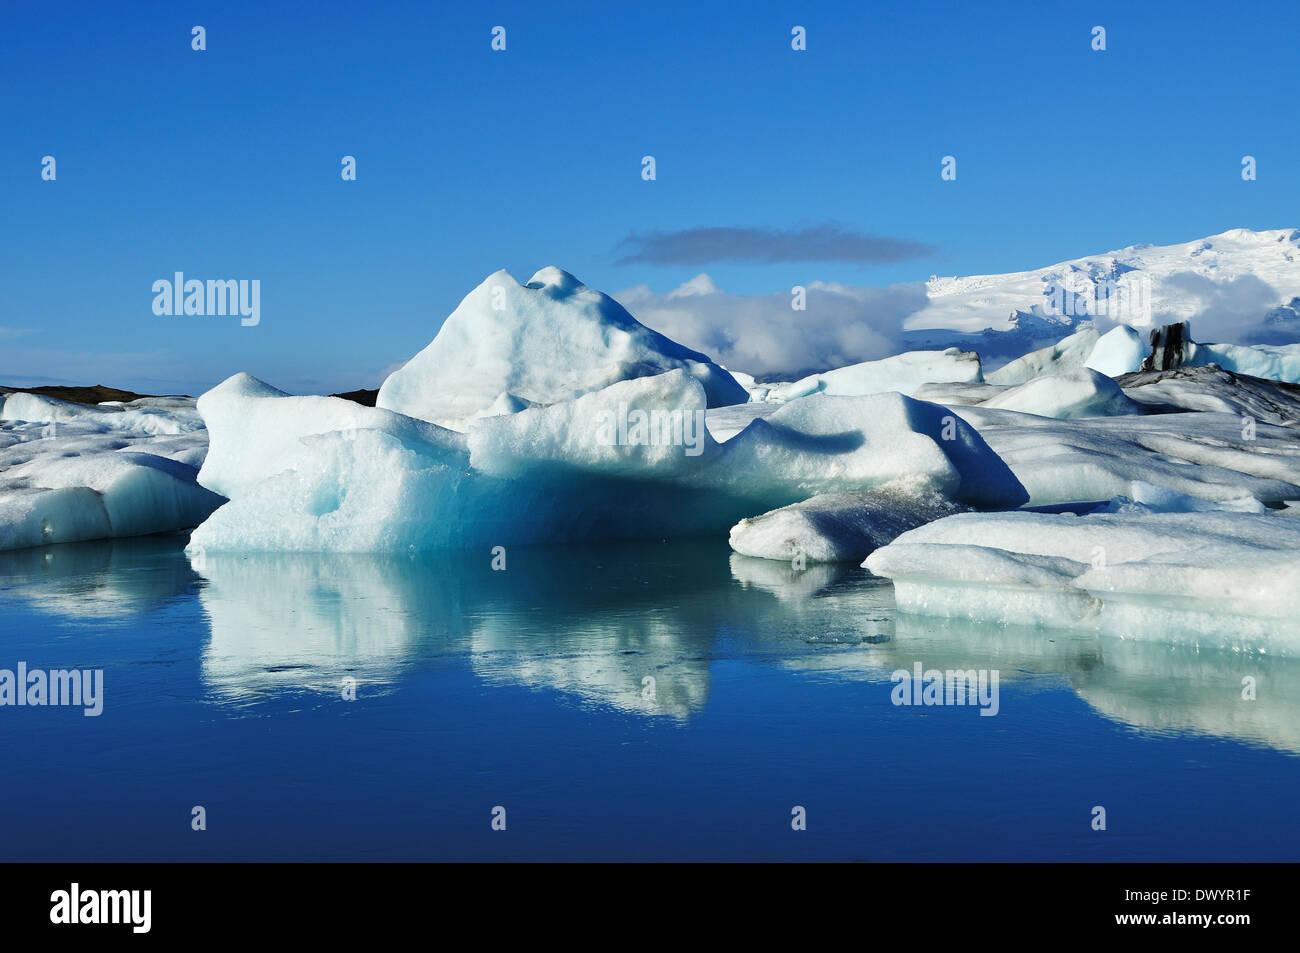 Les icebergs bleu flottant dans la lagune jokulsarlon en Islande Photo Stock